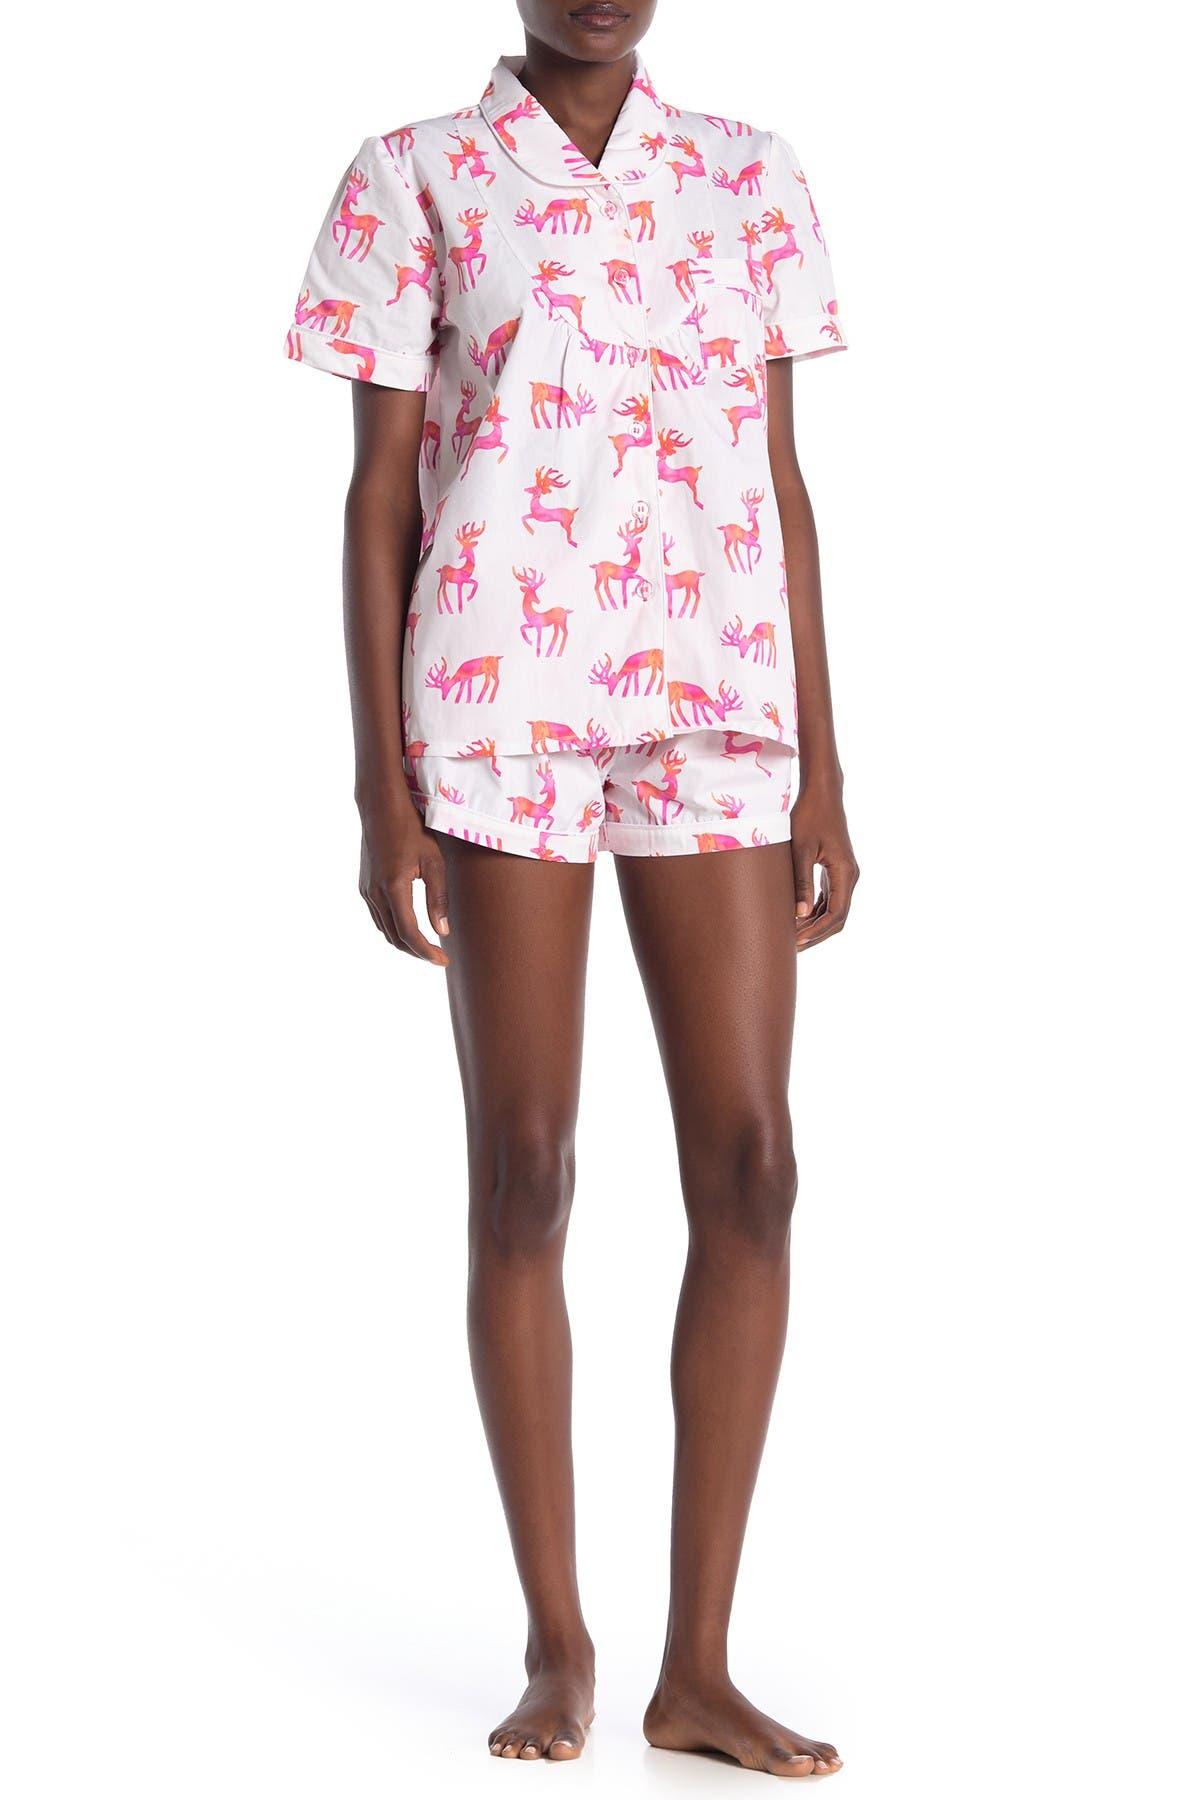 Image of SANT AND ABEL Reindeer Shorts & Shirt Pajama 2-Piece Set